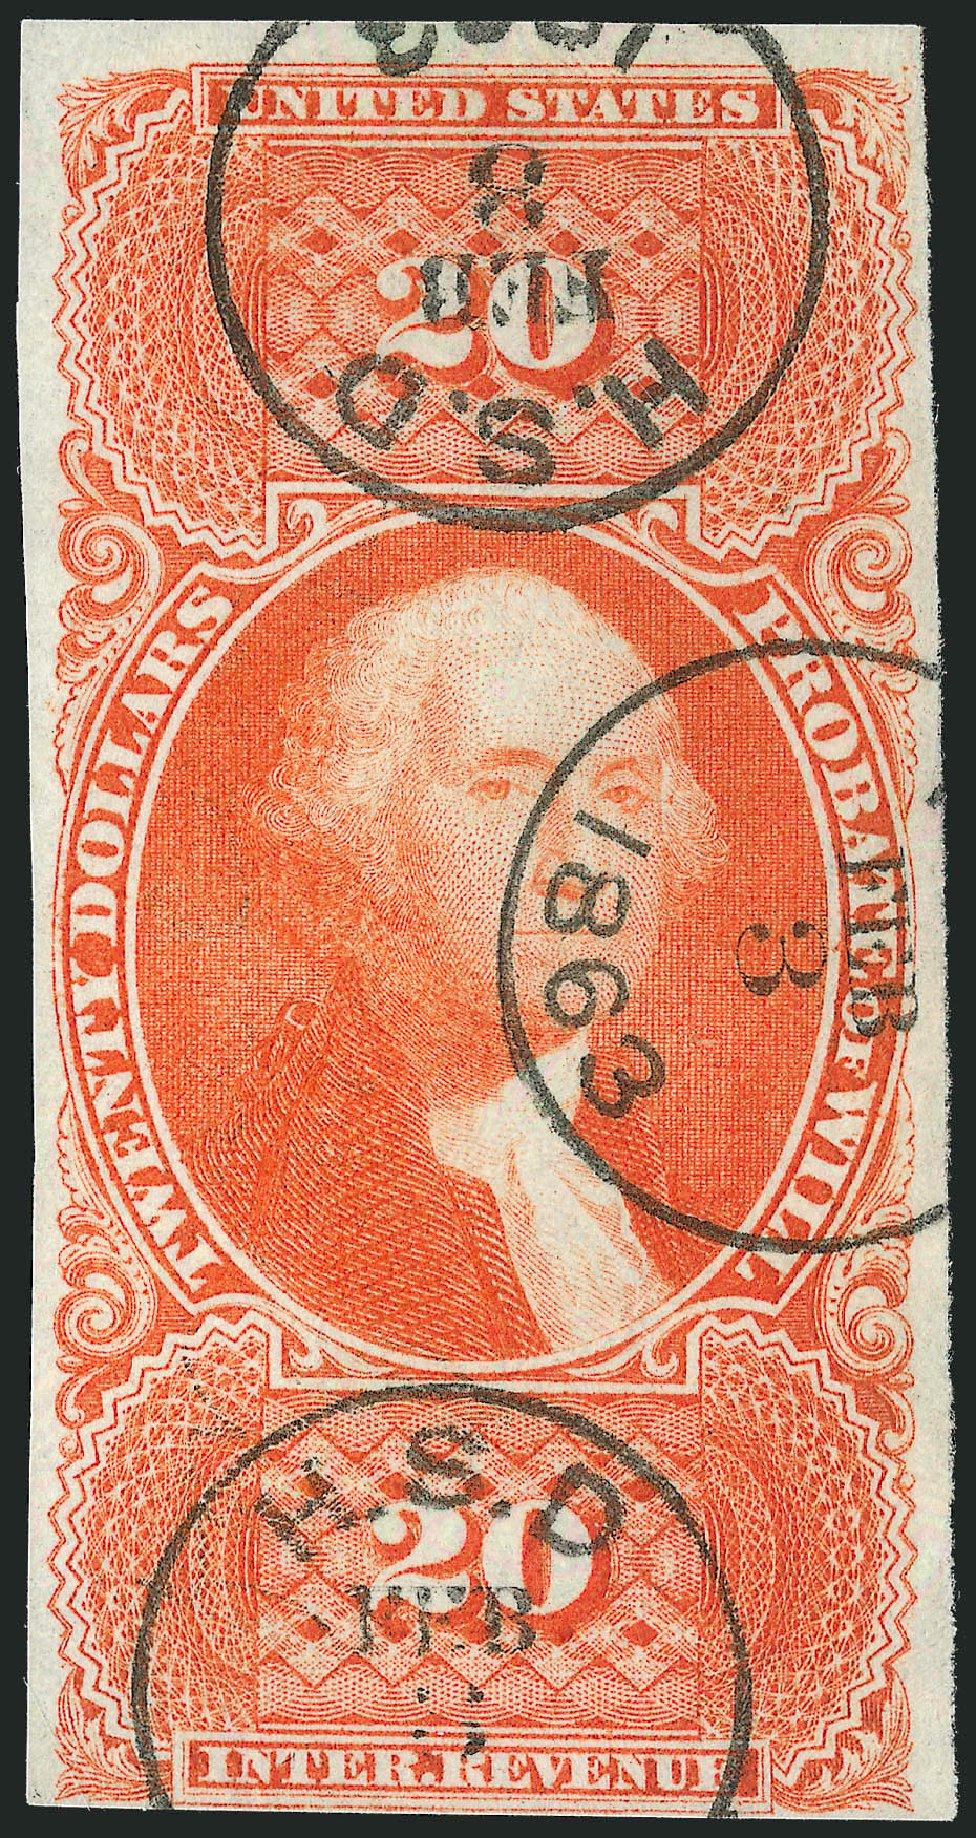 US Stamps Prices Scott Catalogue R99: 1862 US$20.00 Revenue Probate of Will. Robert Siegel Auction Galleries, Jun 2015, Sale 1100, Lot 167